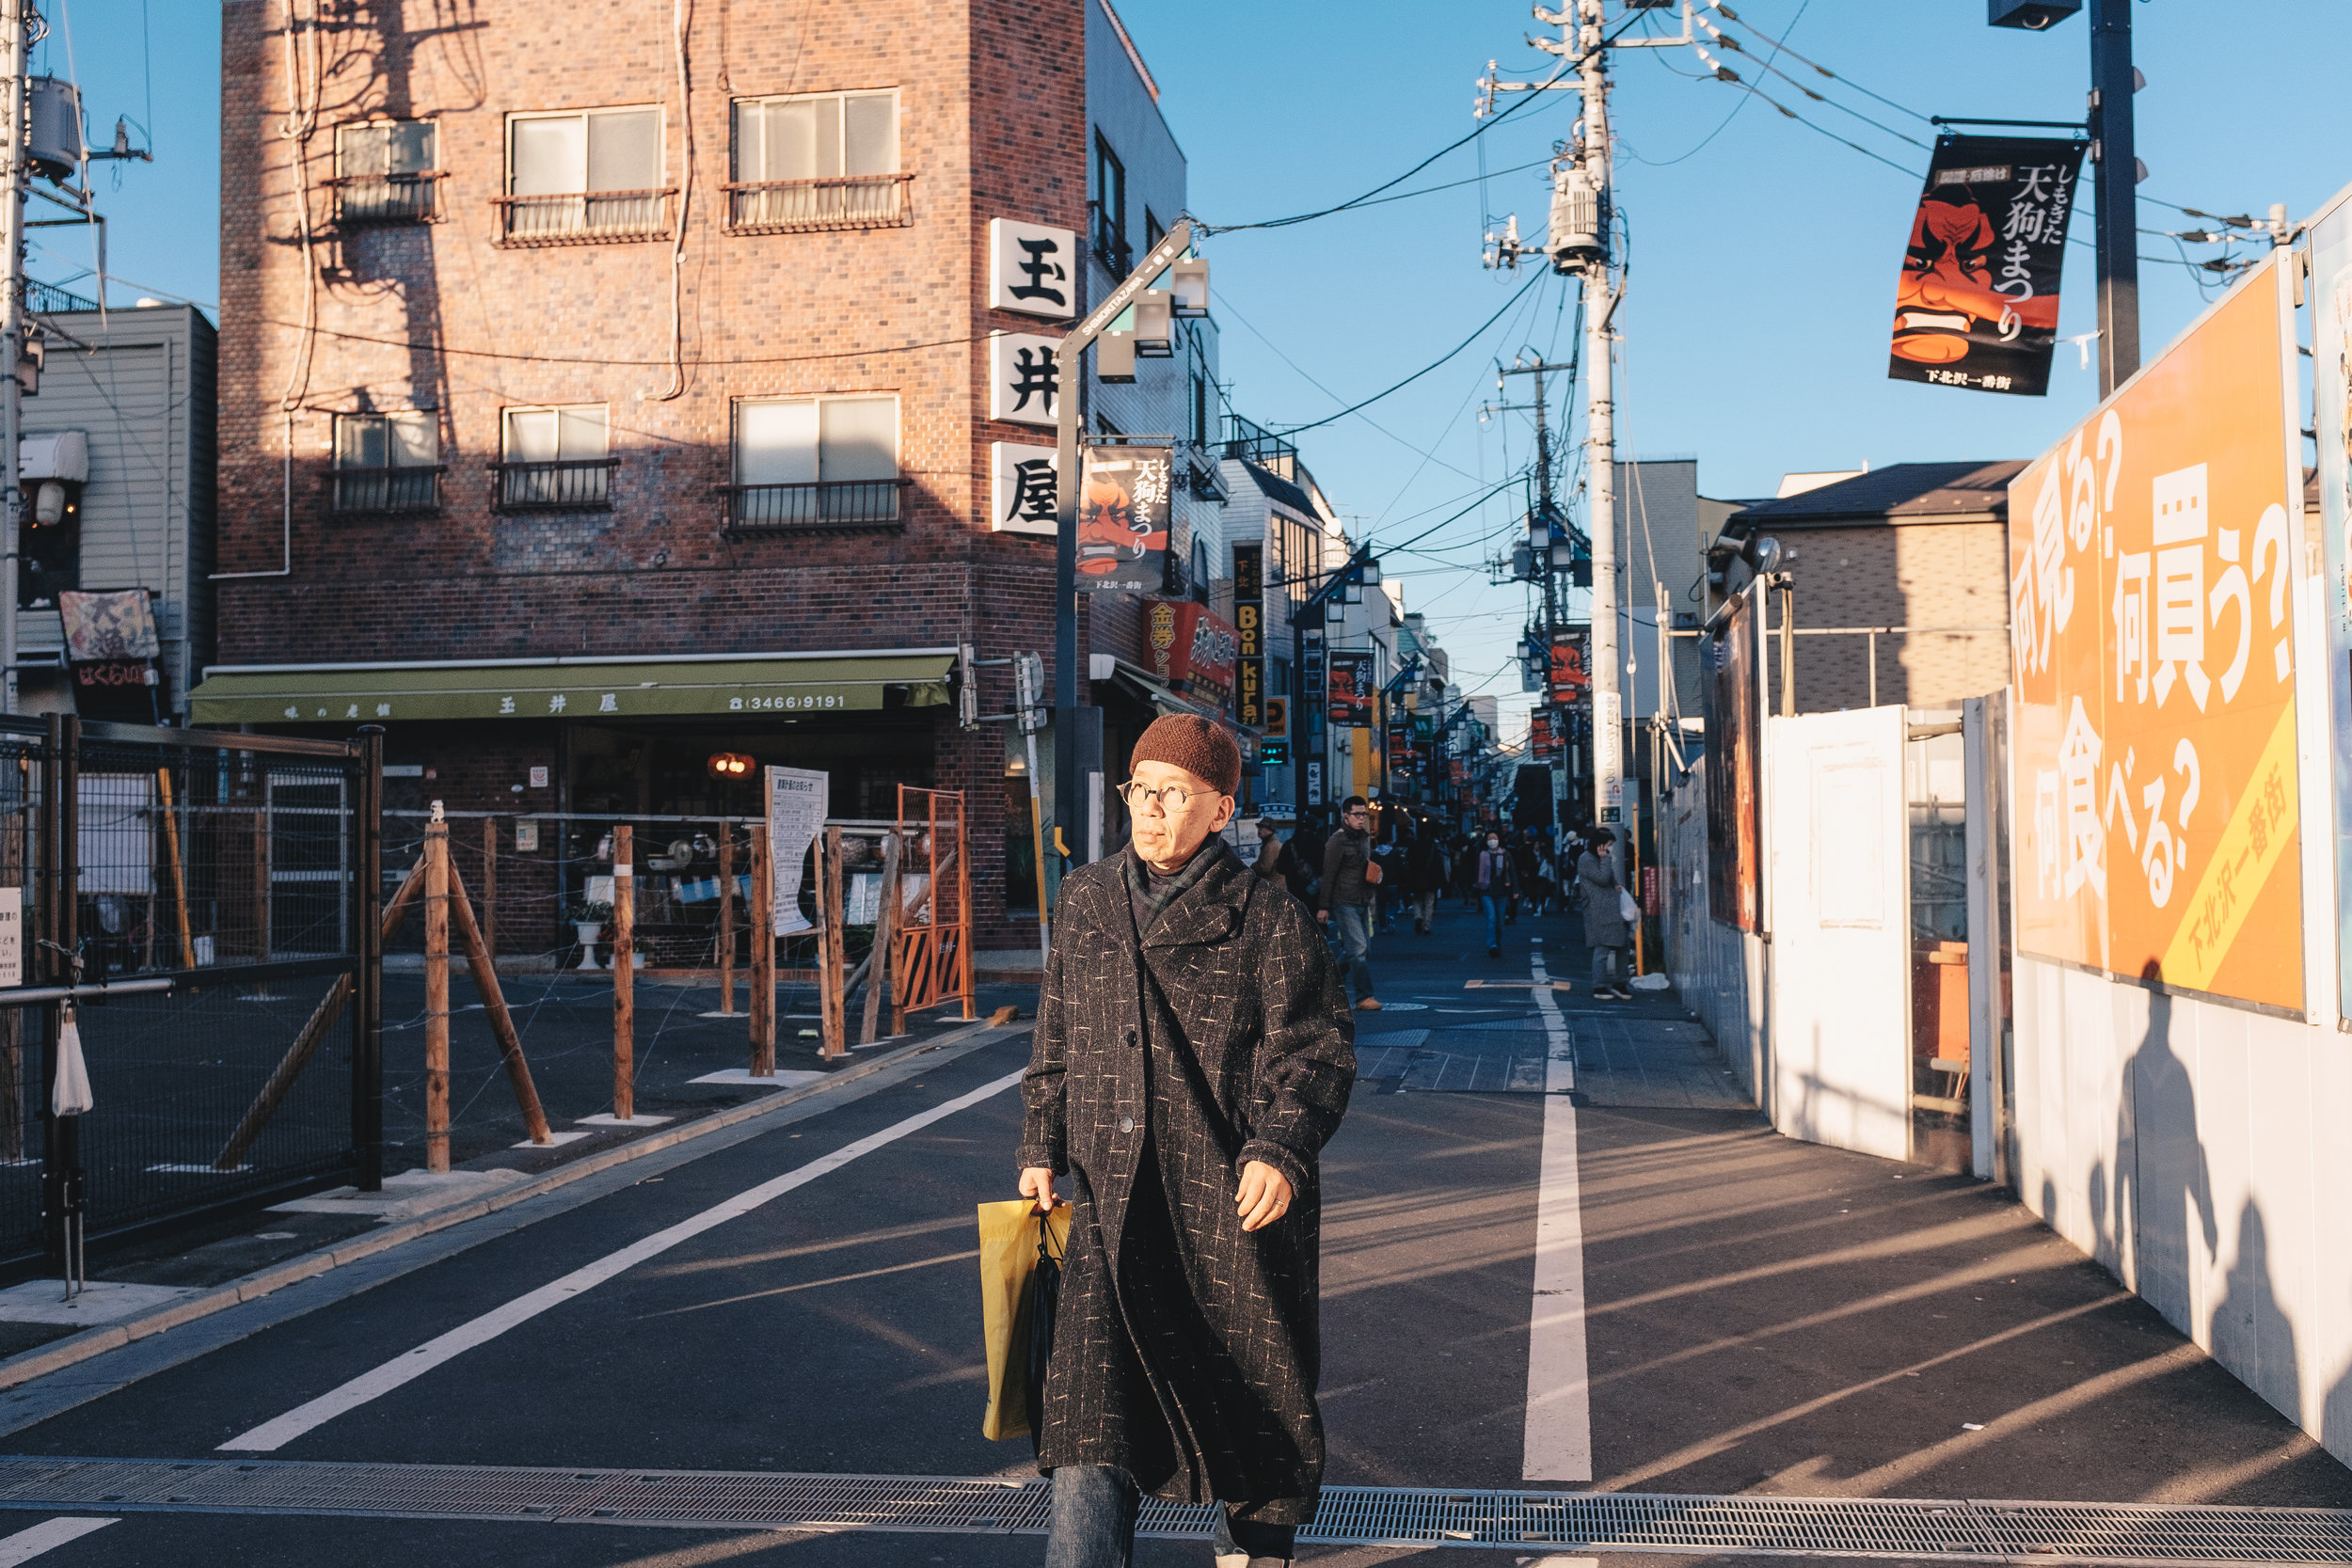 shimokitazawa-vintage-fashion.jpg